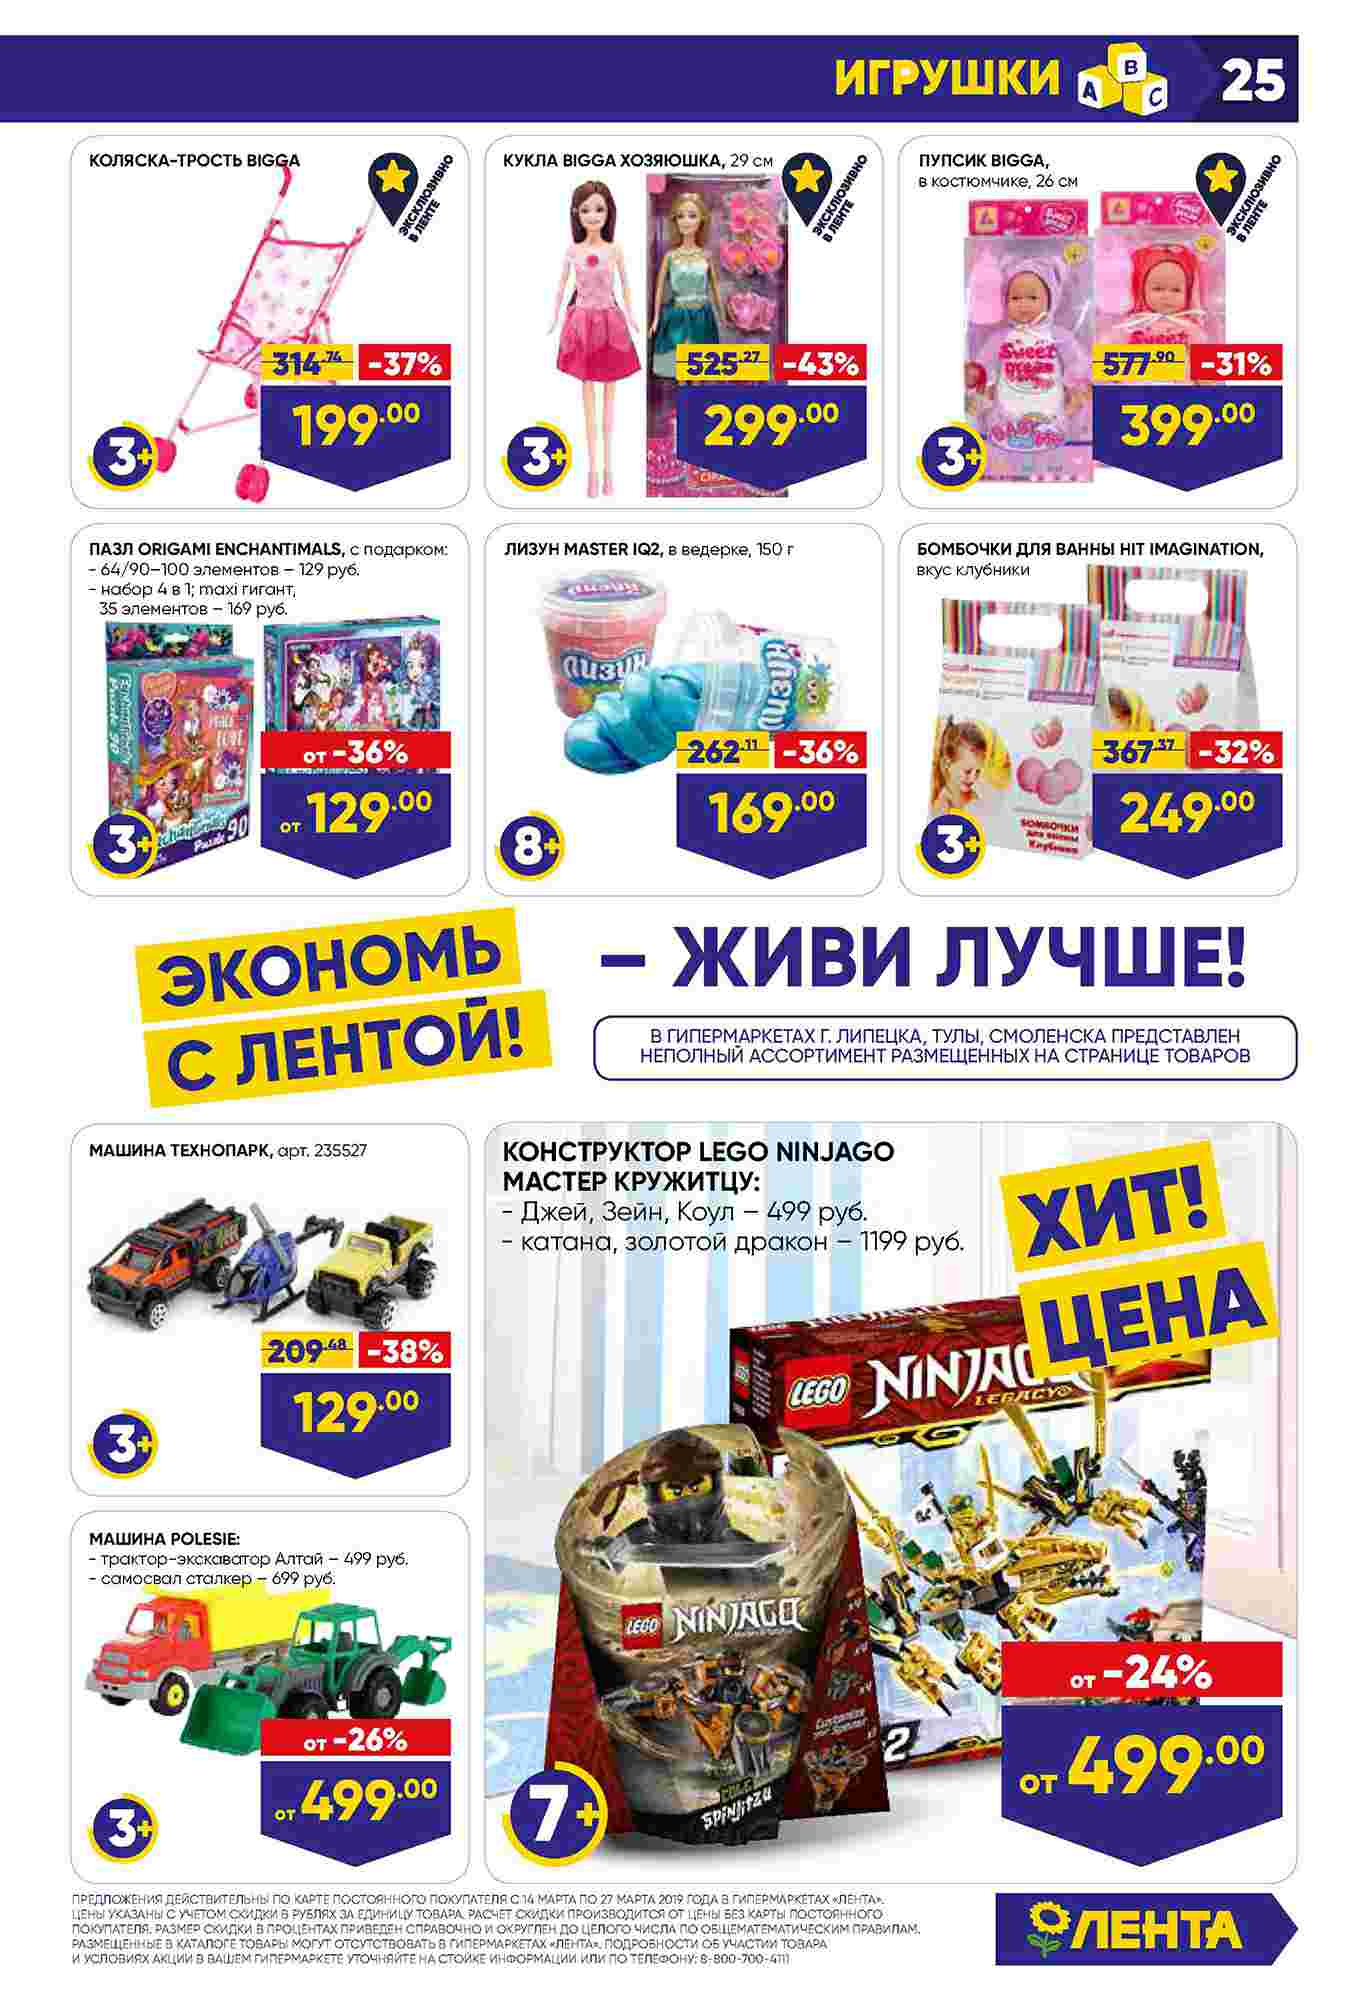 Каталог Лента гипермаркет 14-27.03.2019 стр. - 0001 - 0025